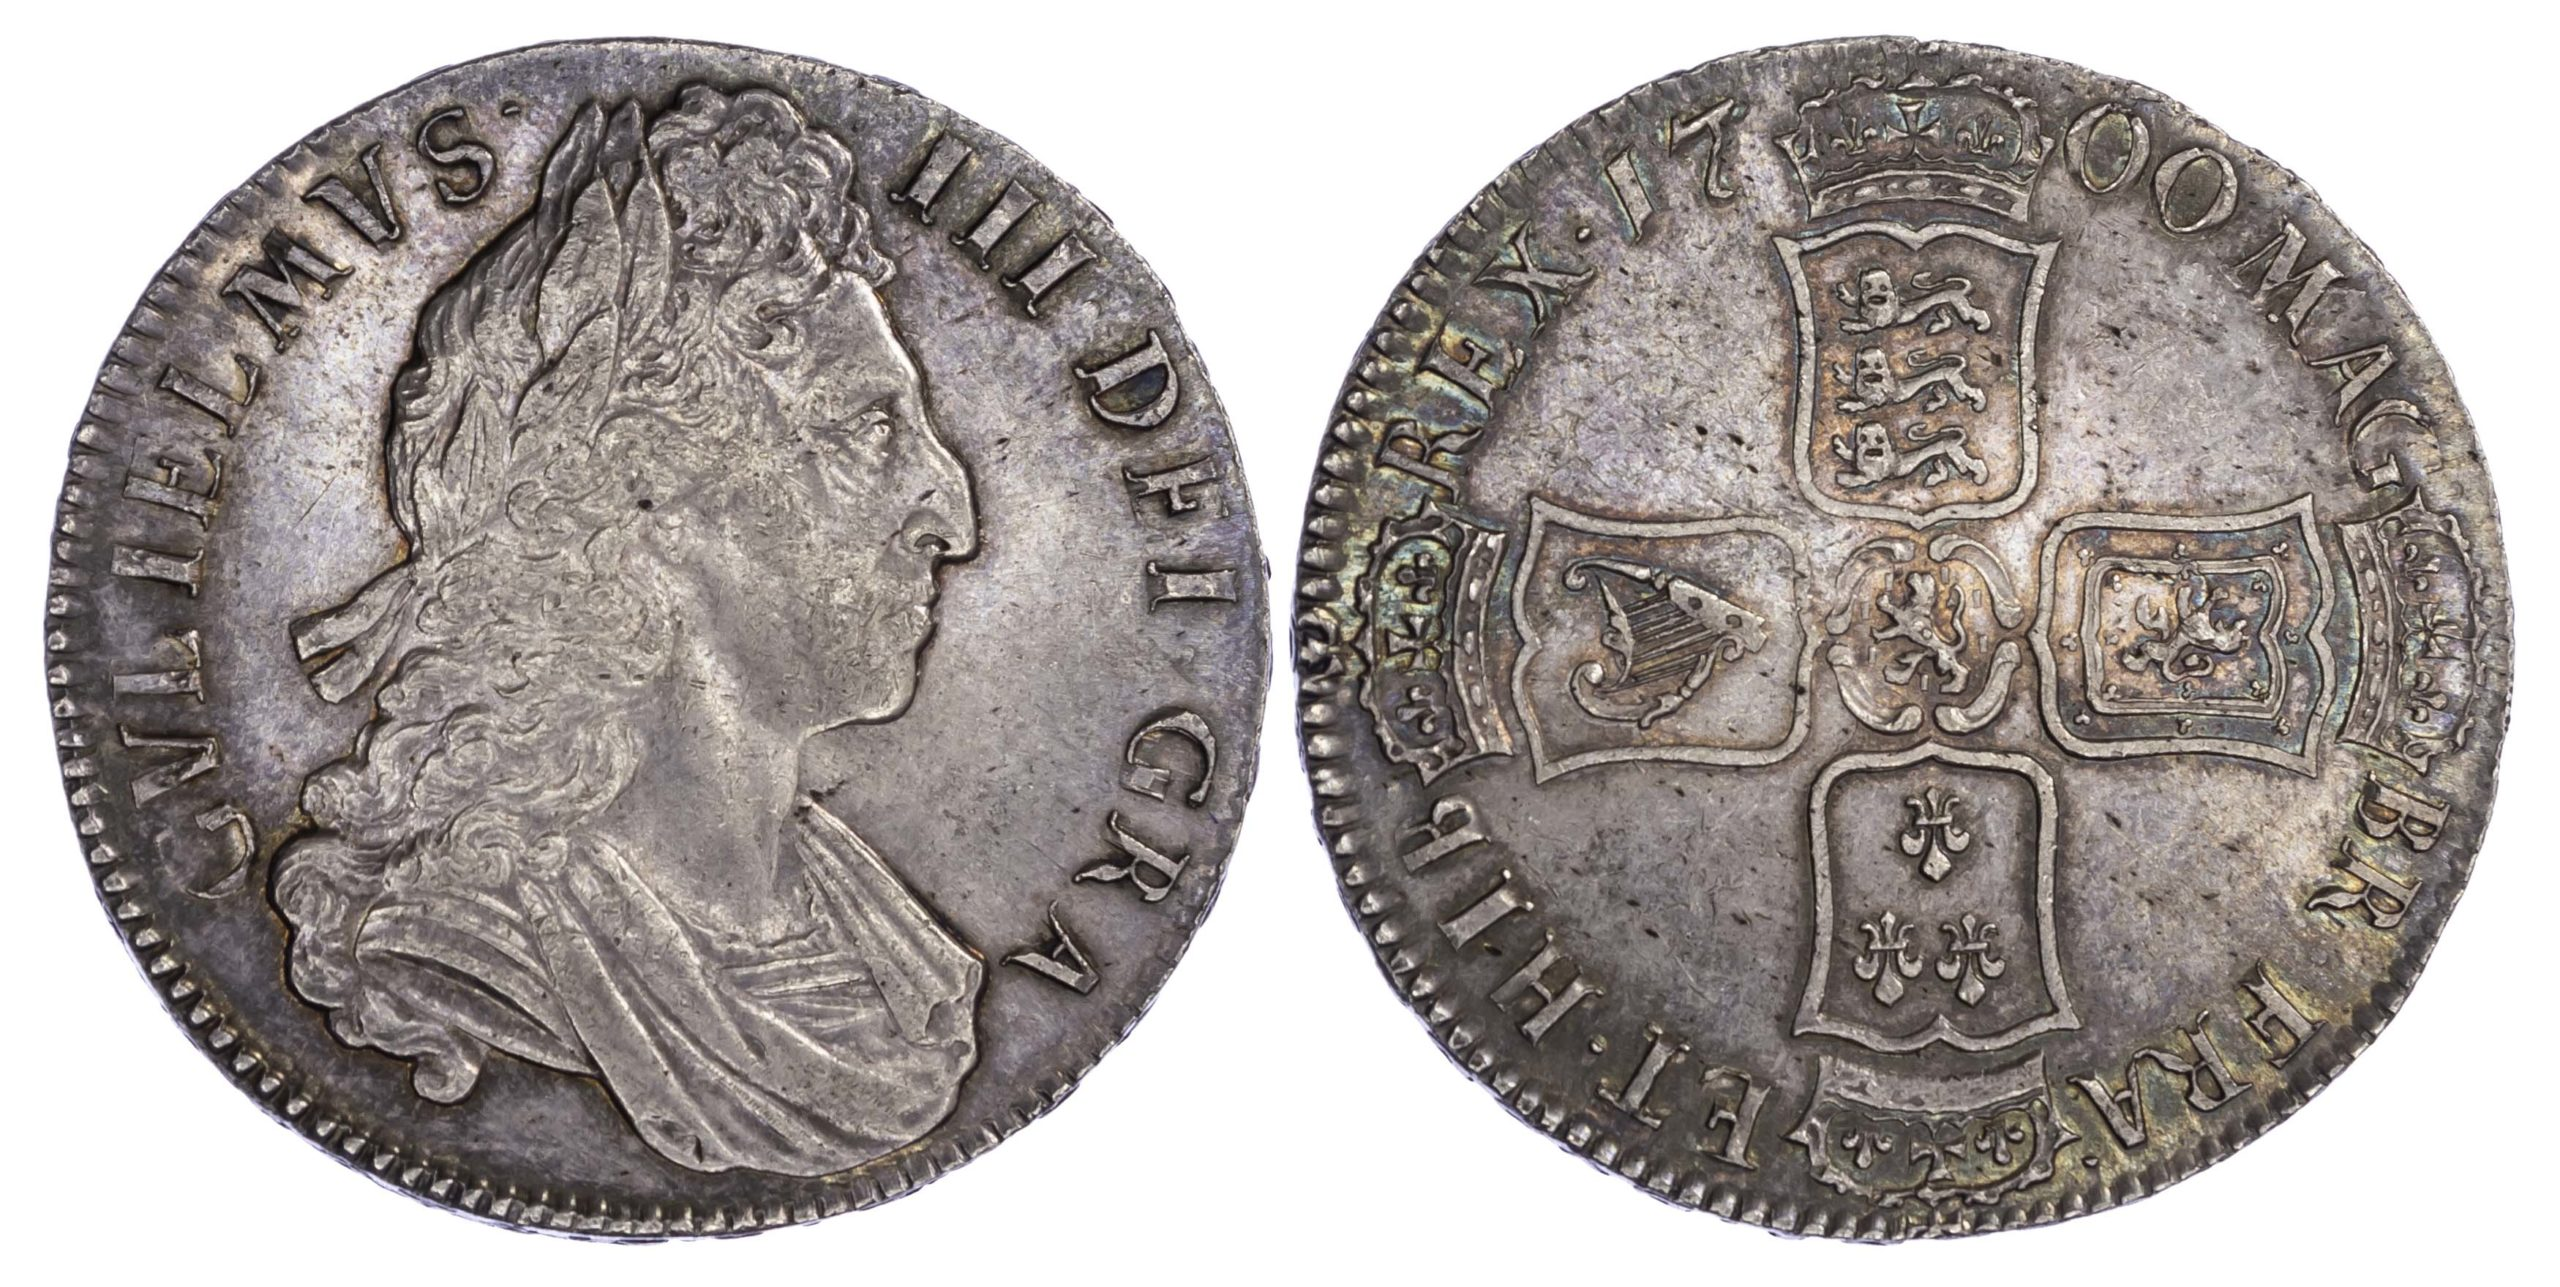 William III (1694-1702), Crown, 1700, DVODECIMO edge